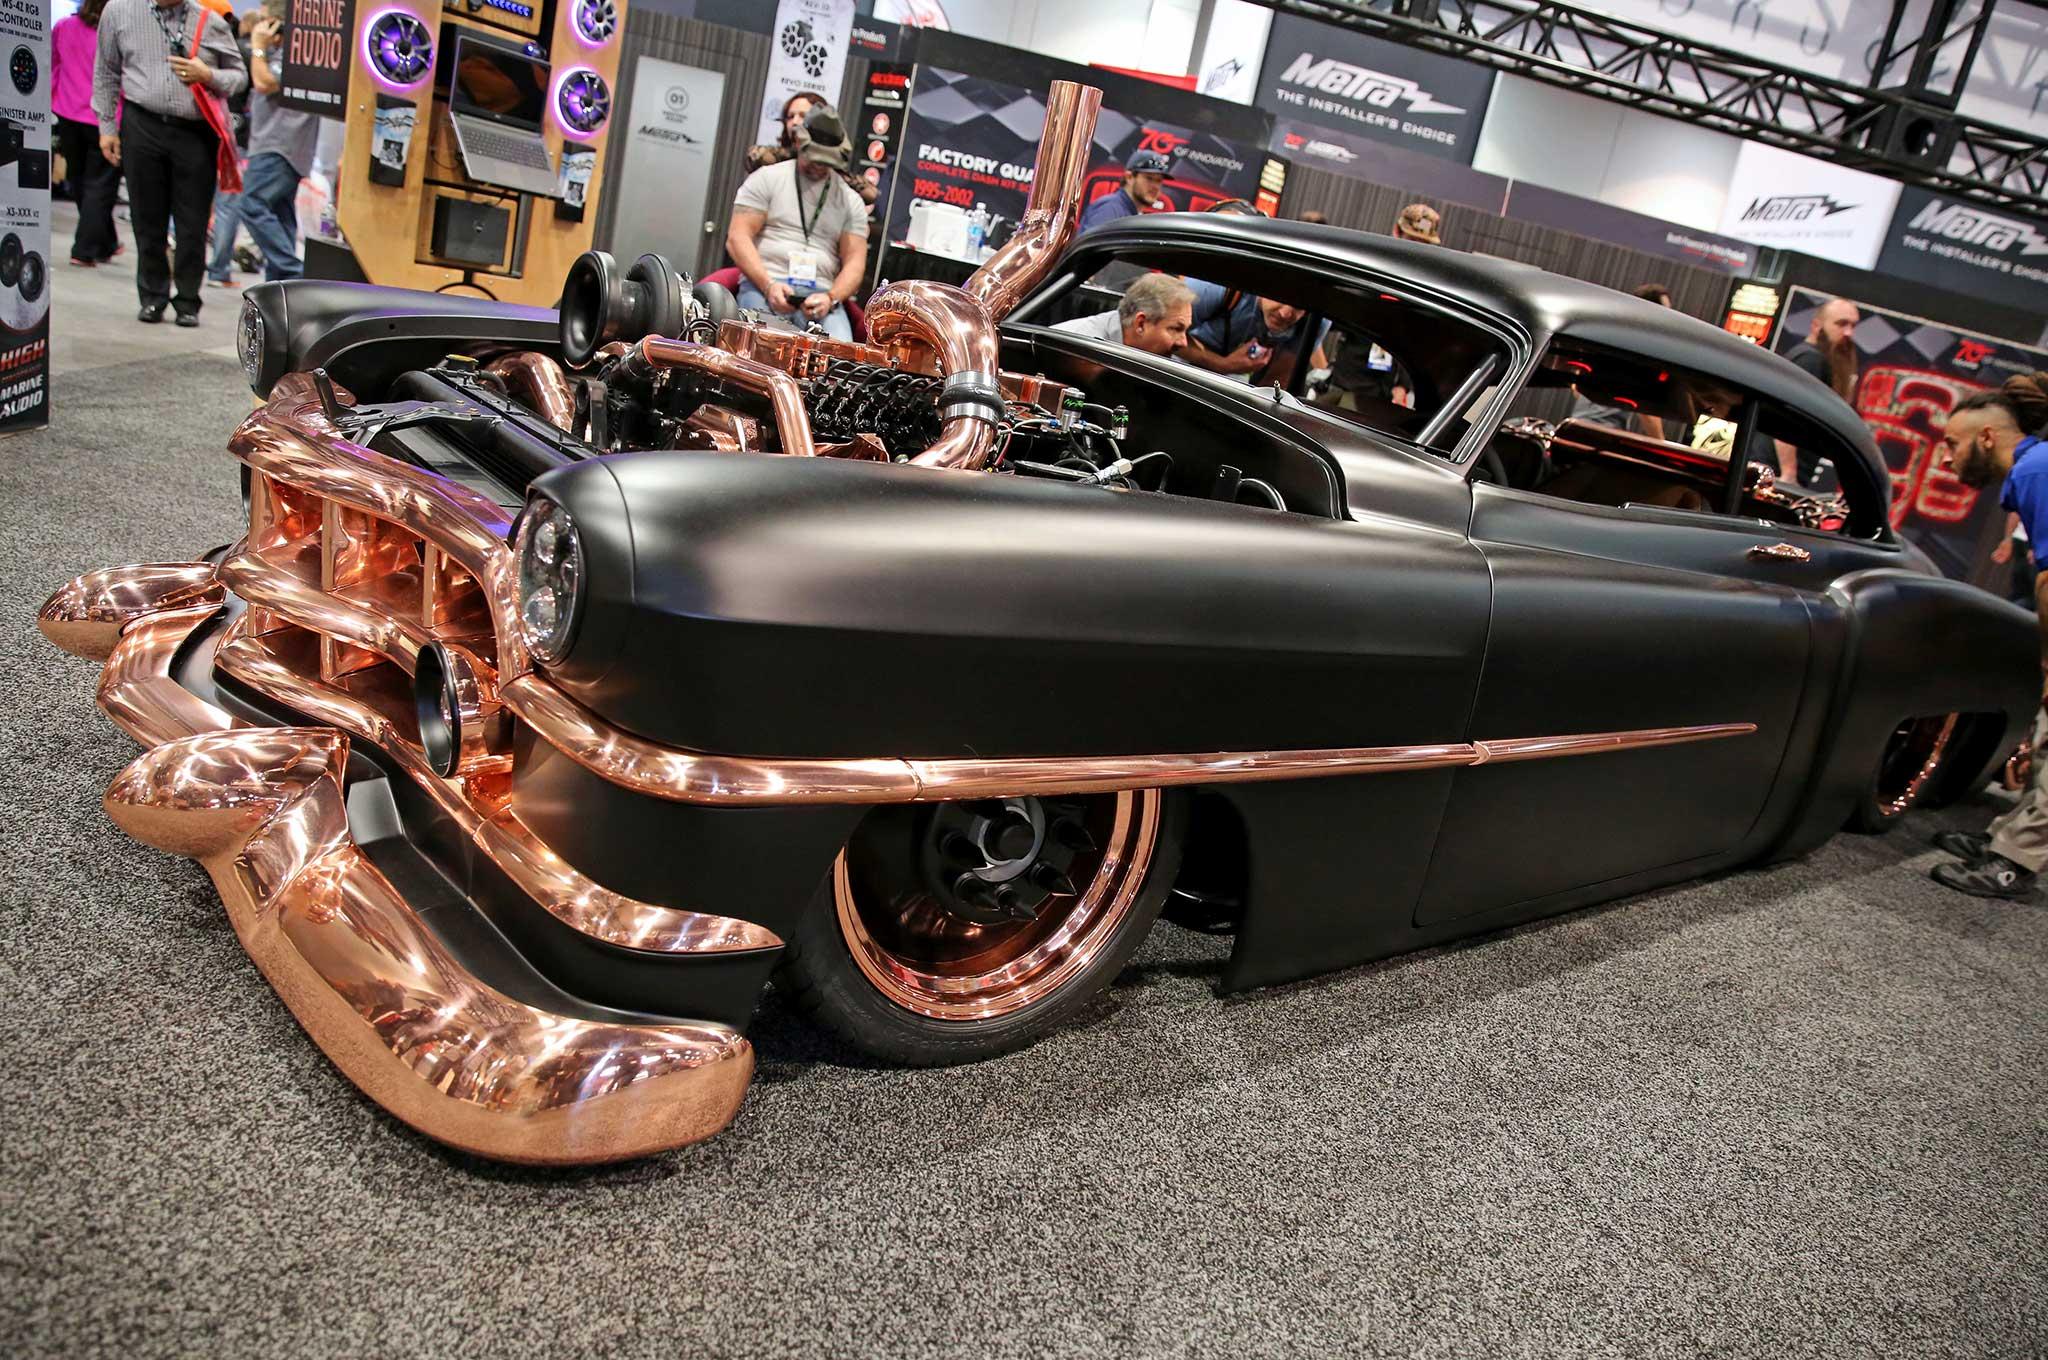 Cummins-Powered 1950 Copper Cadillac at SEMA 2016 #TENSEMA16